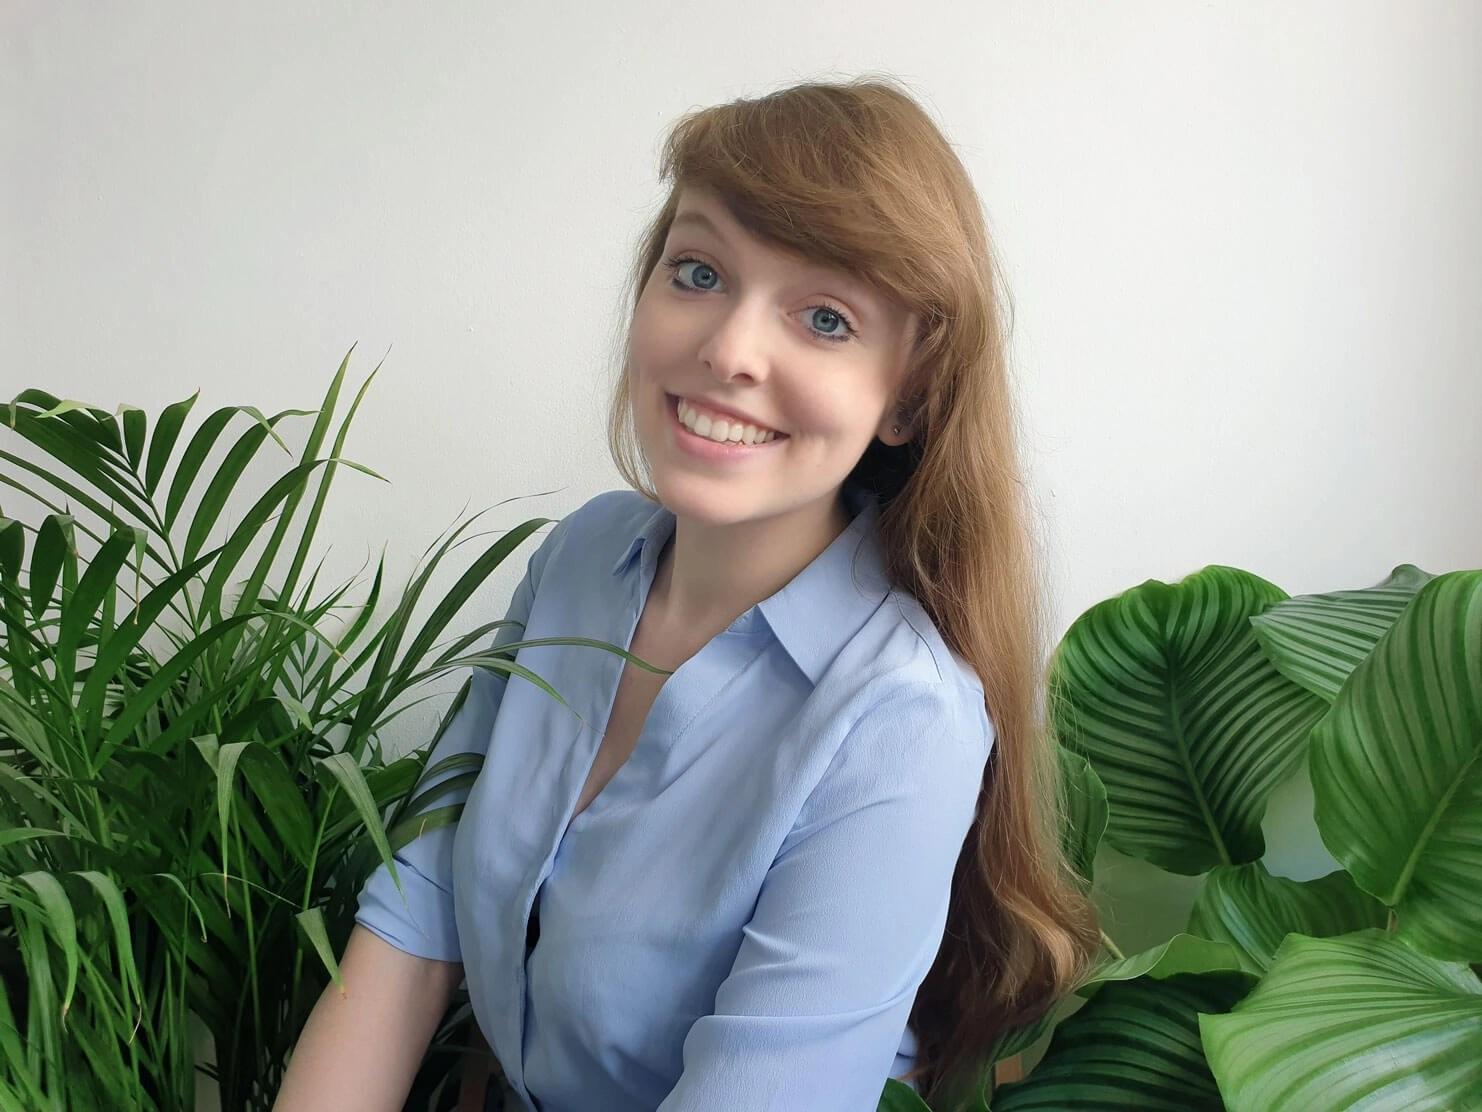 Adrianna Leszczynska of MintSwift - London Based Freelance Illustrator - Profile Picture - Full Size